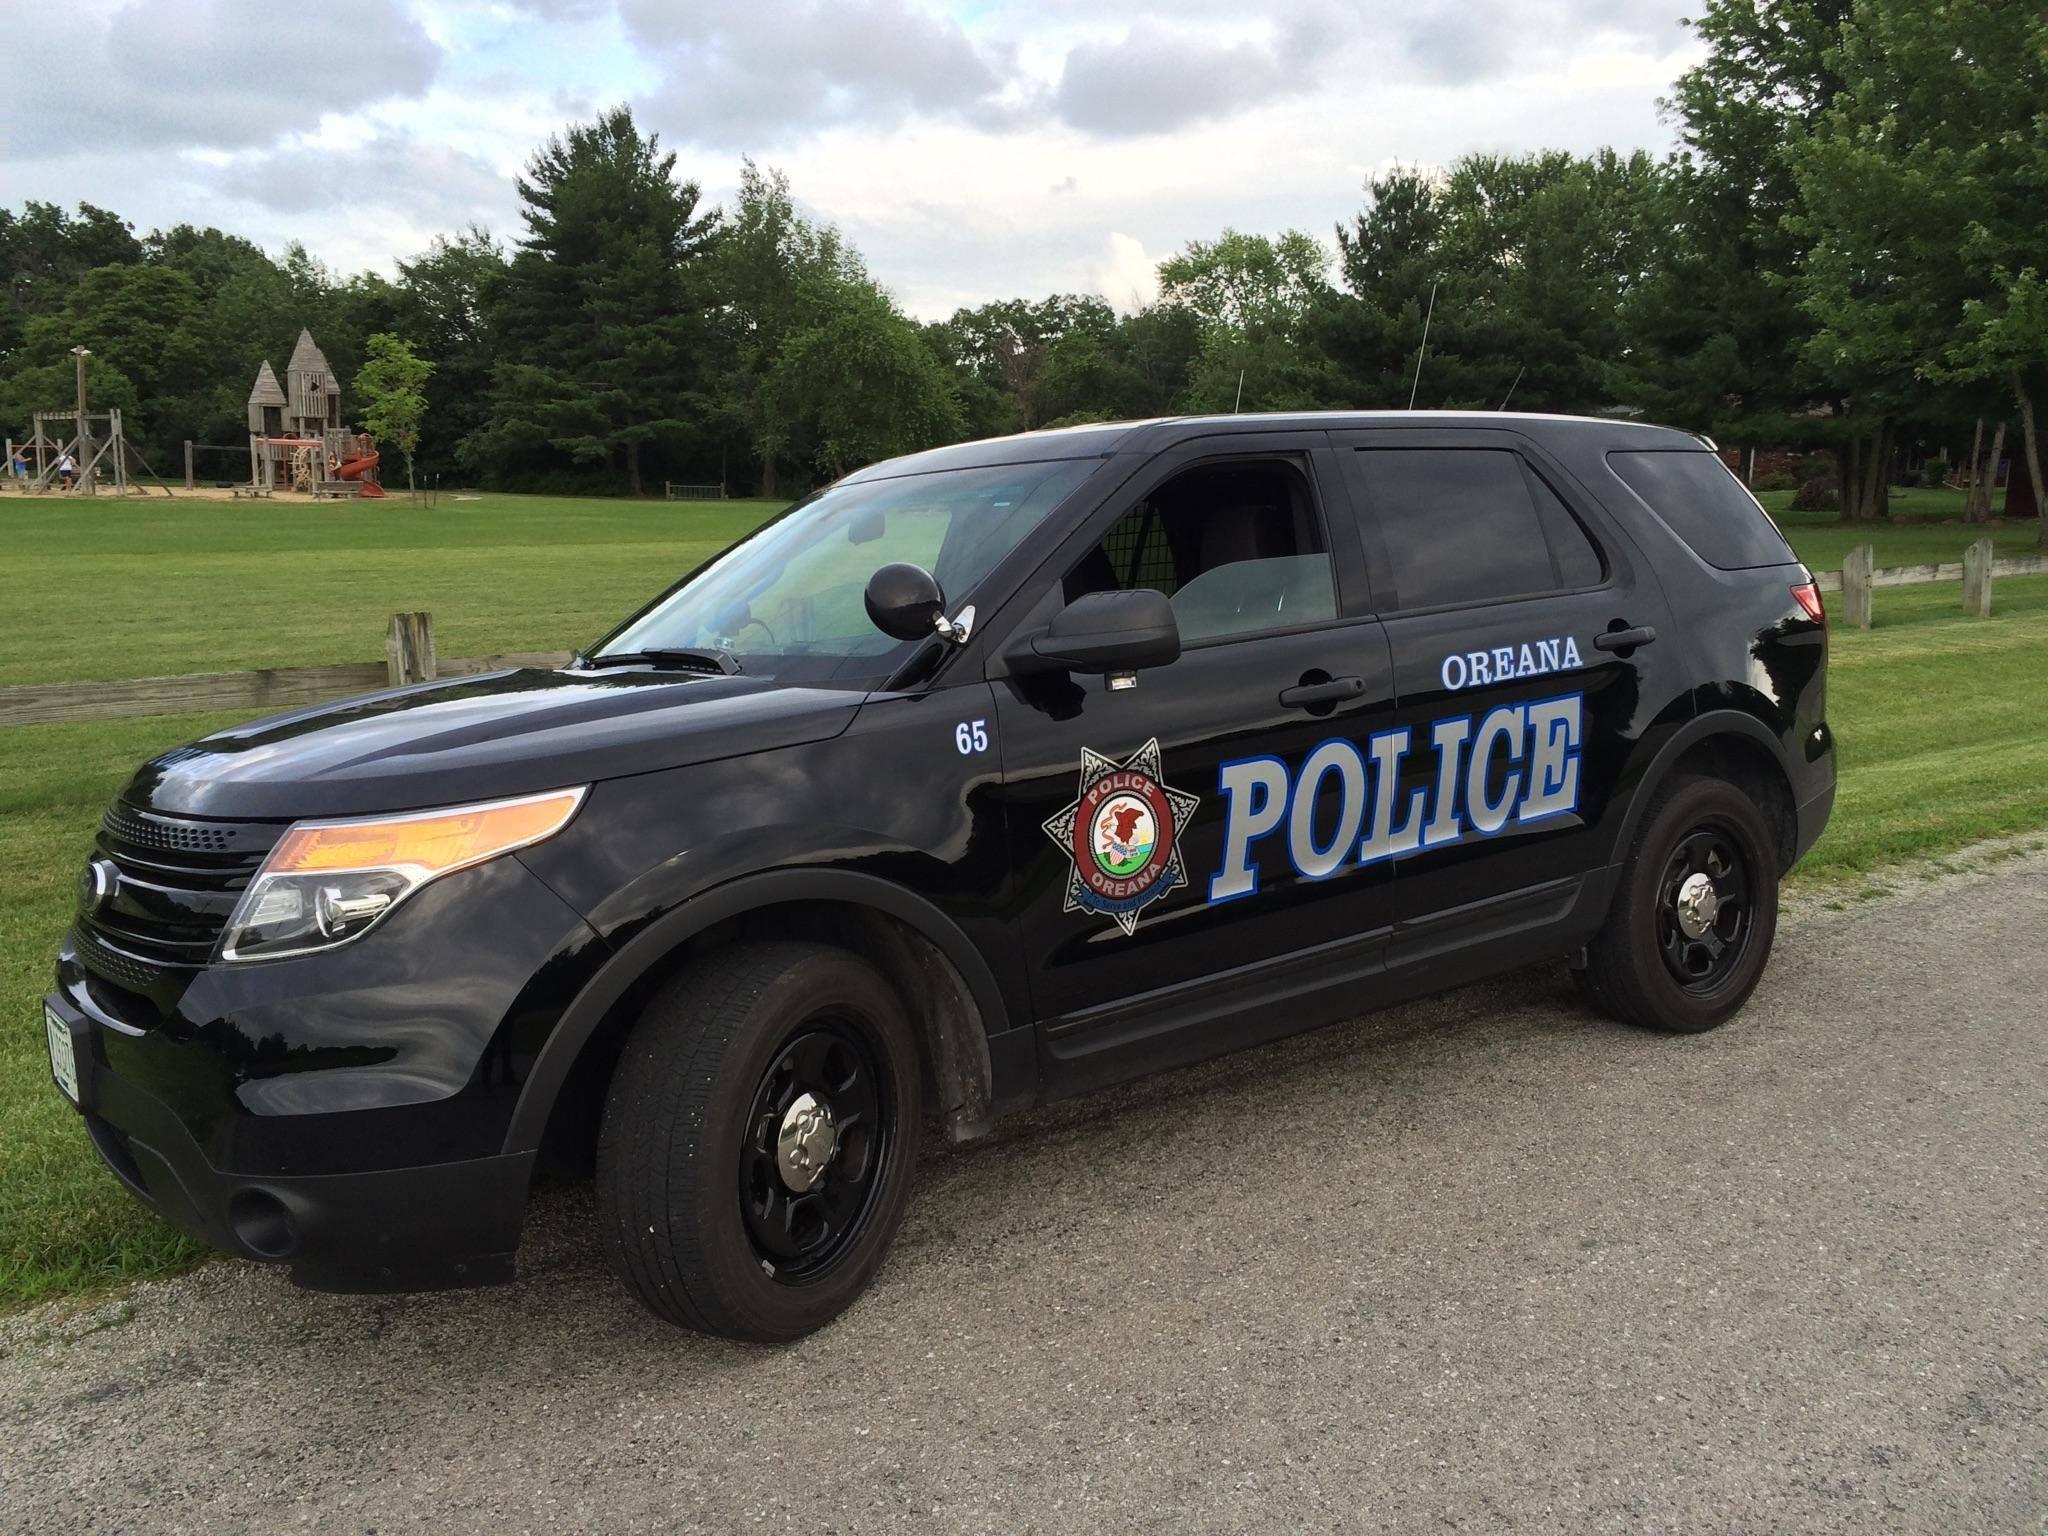 New Oreana Police Vehicle